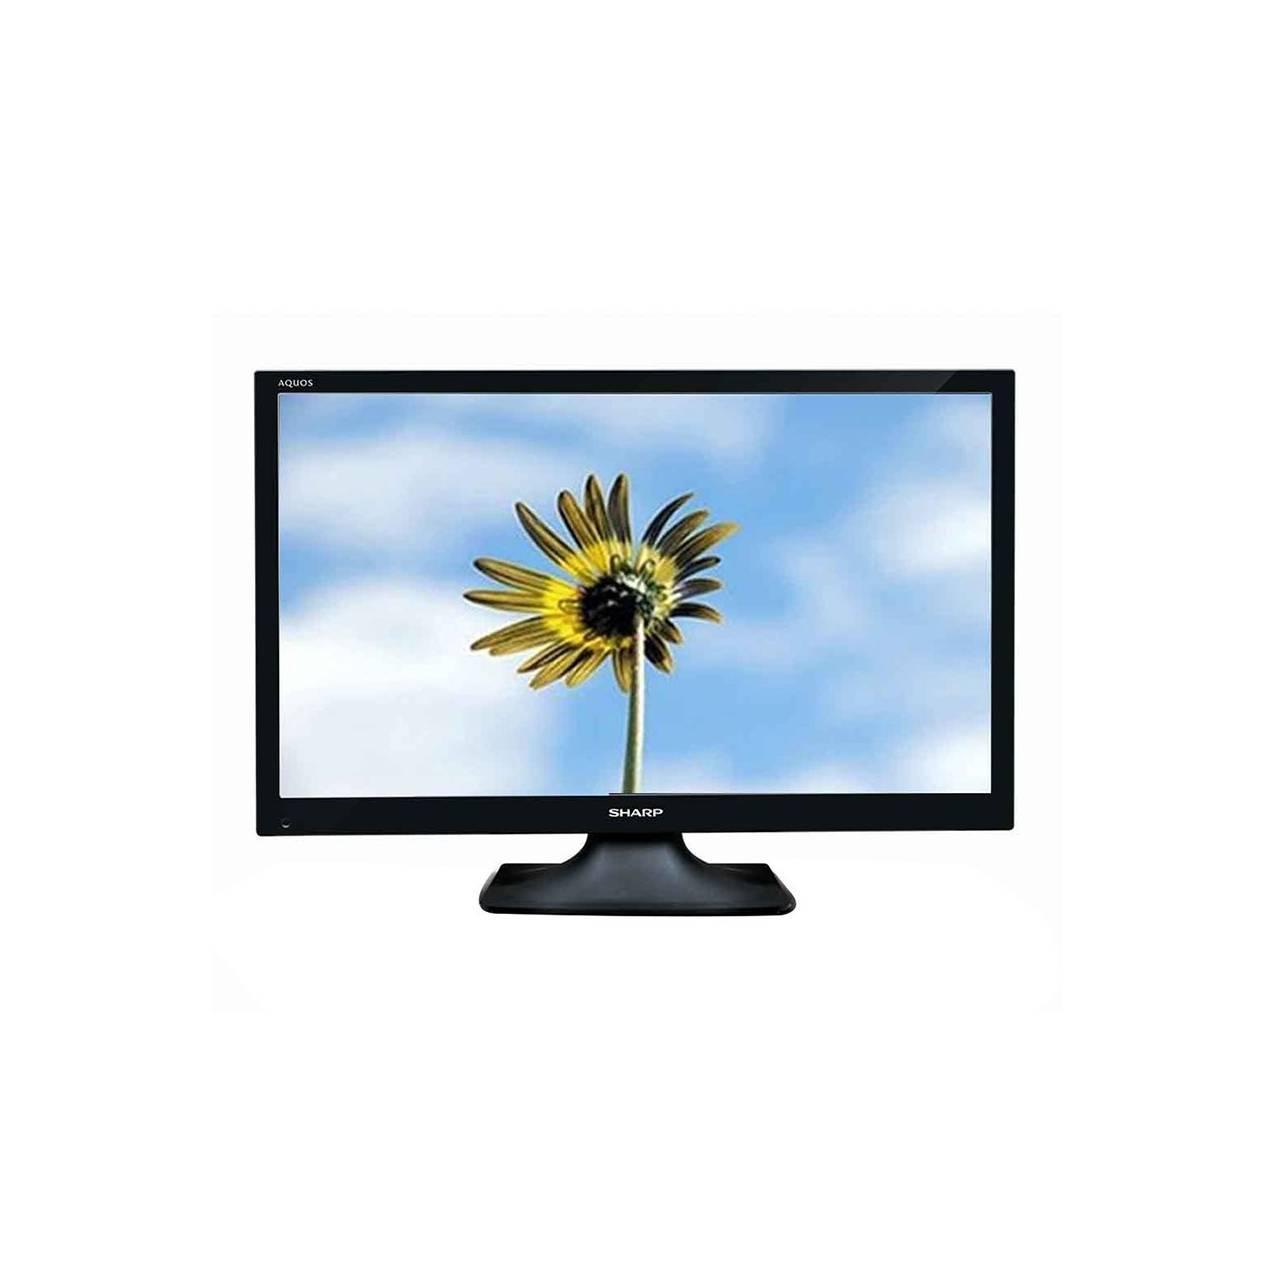 SHARP LED TV - 24 Inch - LC24SA4000I ,USB MOVIE, model terbaru,RESMI